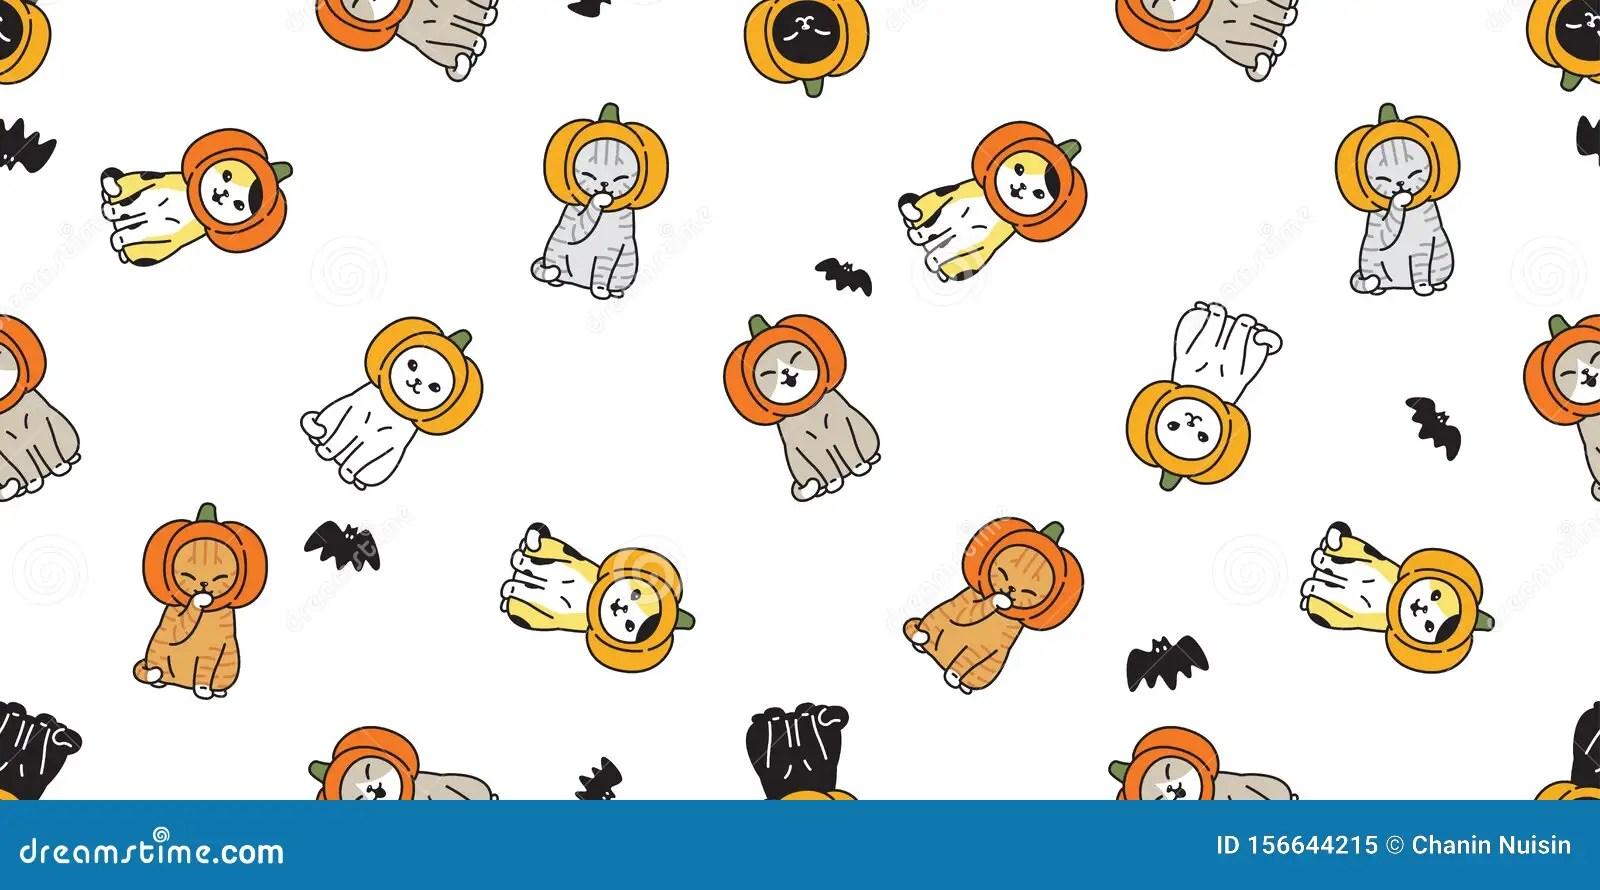 2000x1333 halloween black cat pumpkin. Cat Seamless Pattern Halloween Pumpkin Head Kitten Calico Bat Scarf Isolated Tile Background Repeat Wallpaper Cartoon Illus Stock Illustration Illustration Of Meow Icon 156644215